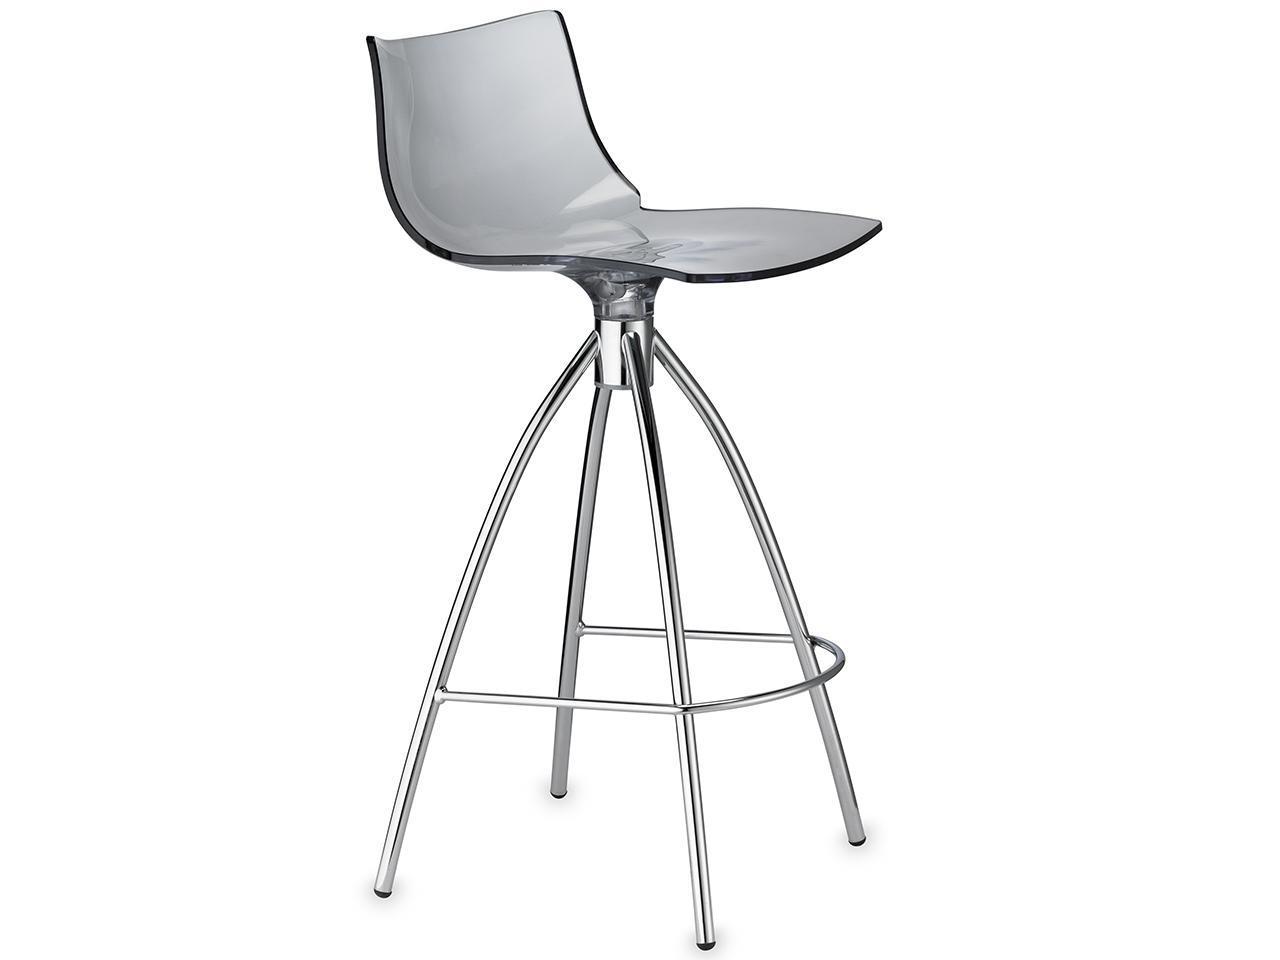 Полубарный пластиковый стул Daylight